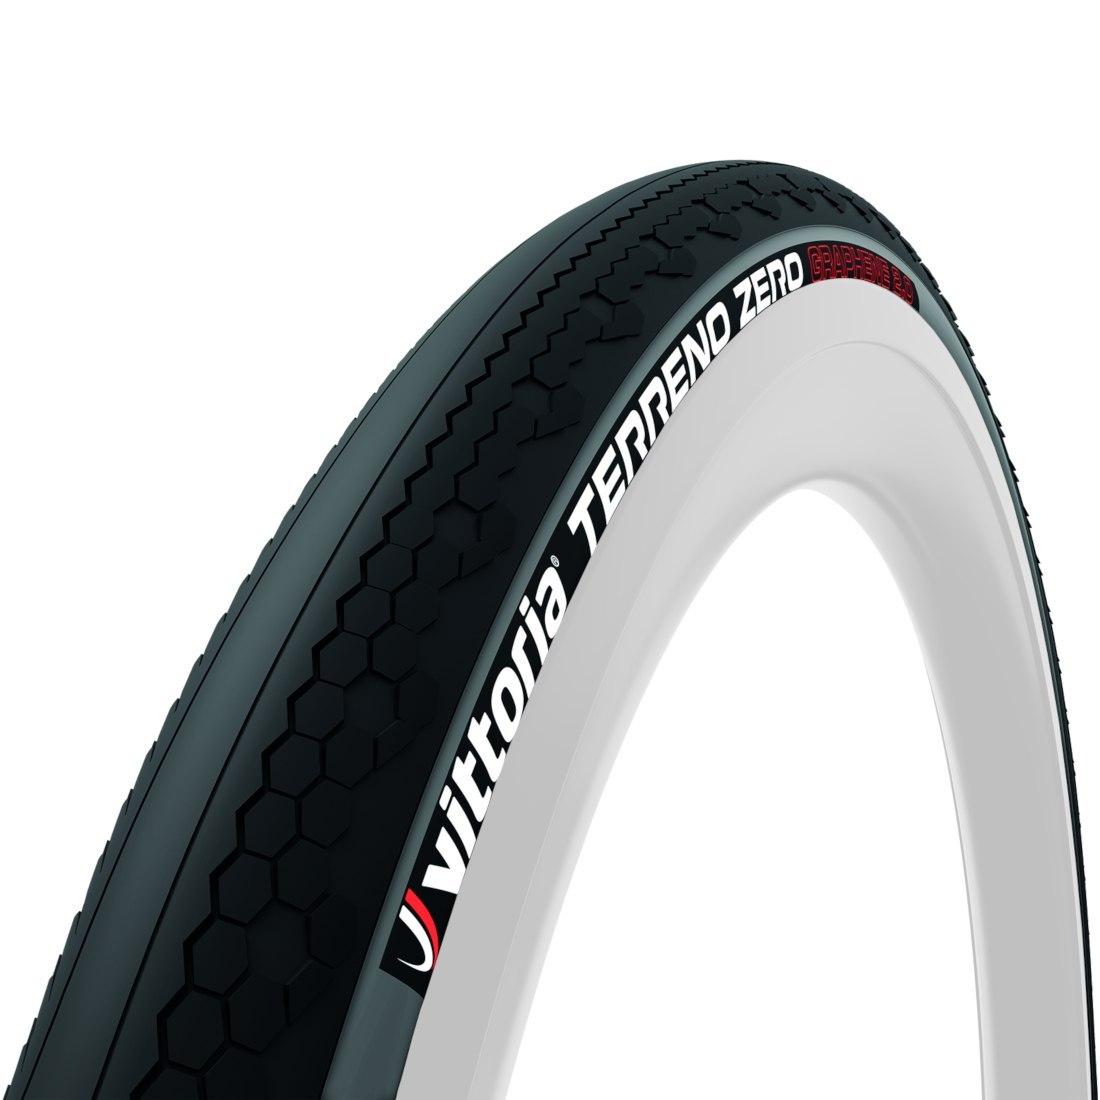 Image of Vittoria Terreno Zero G2.0 TNT Folding Tire - black / anthracite - ETRTO 32-622